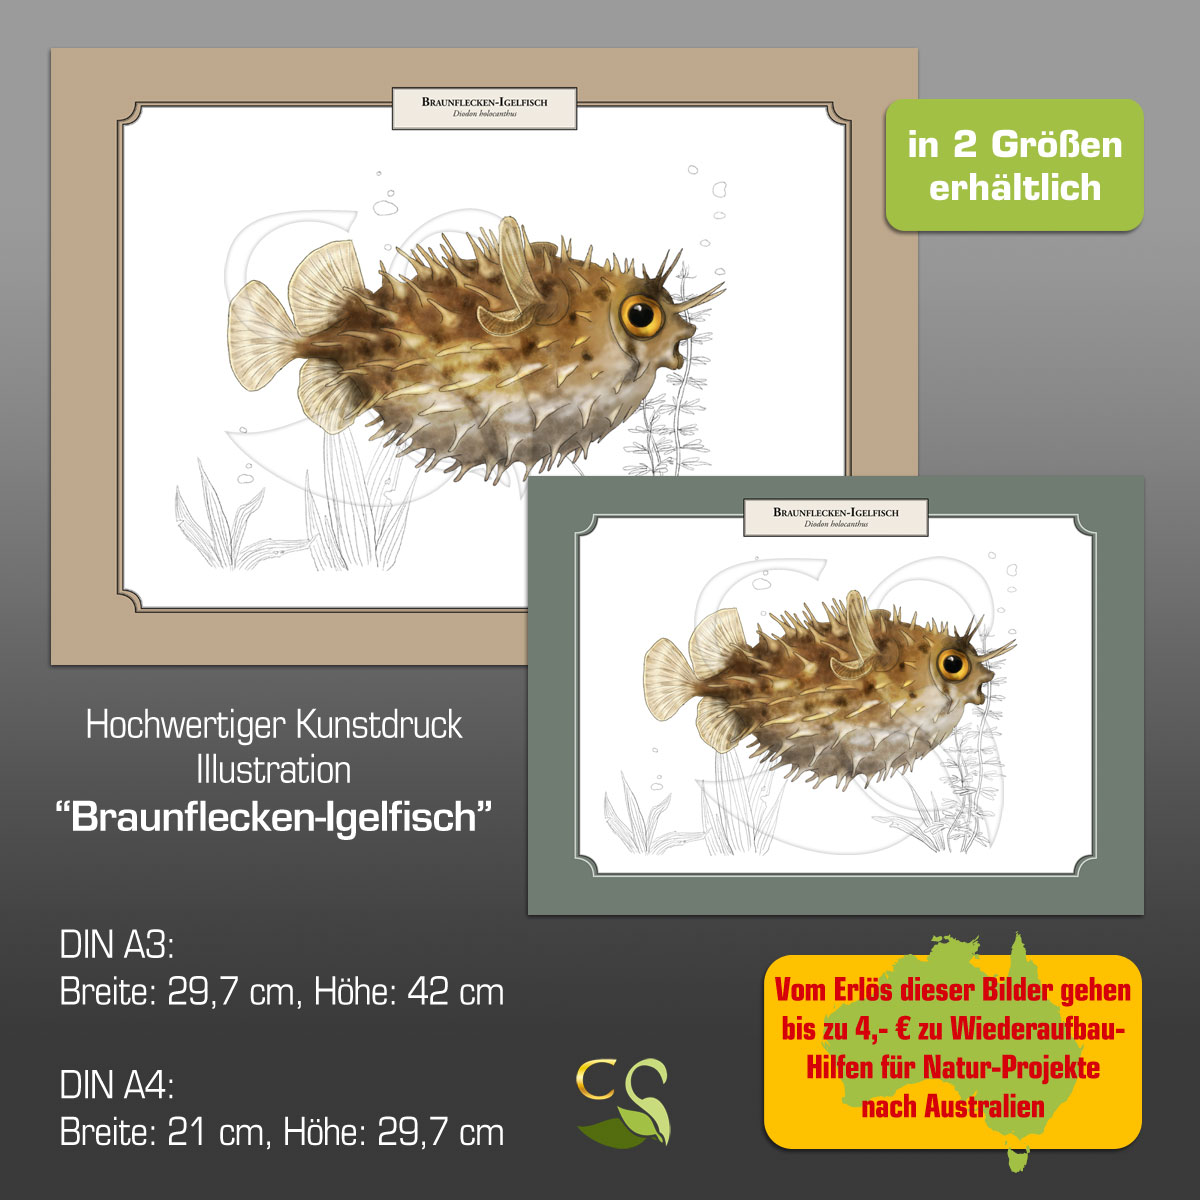 BraunfIgelfisch2GRfA